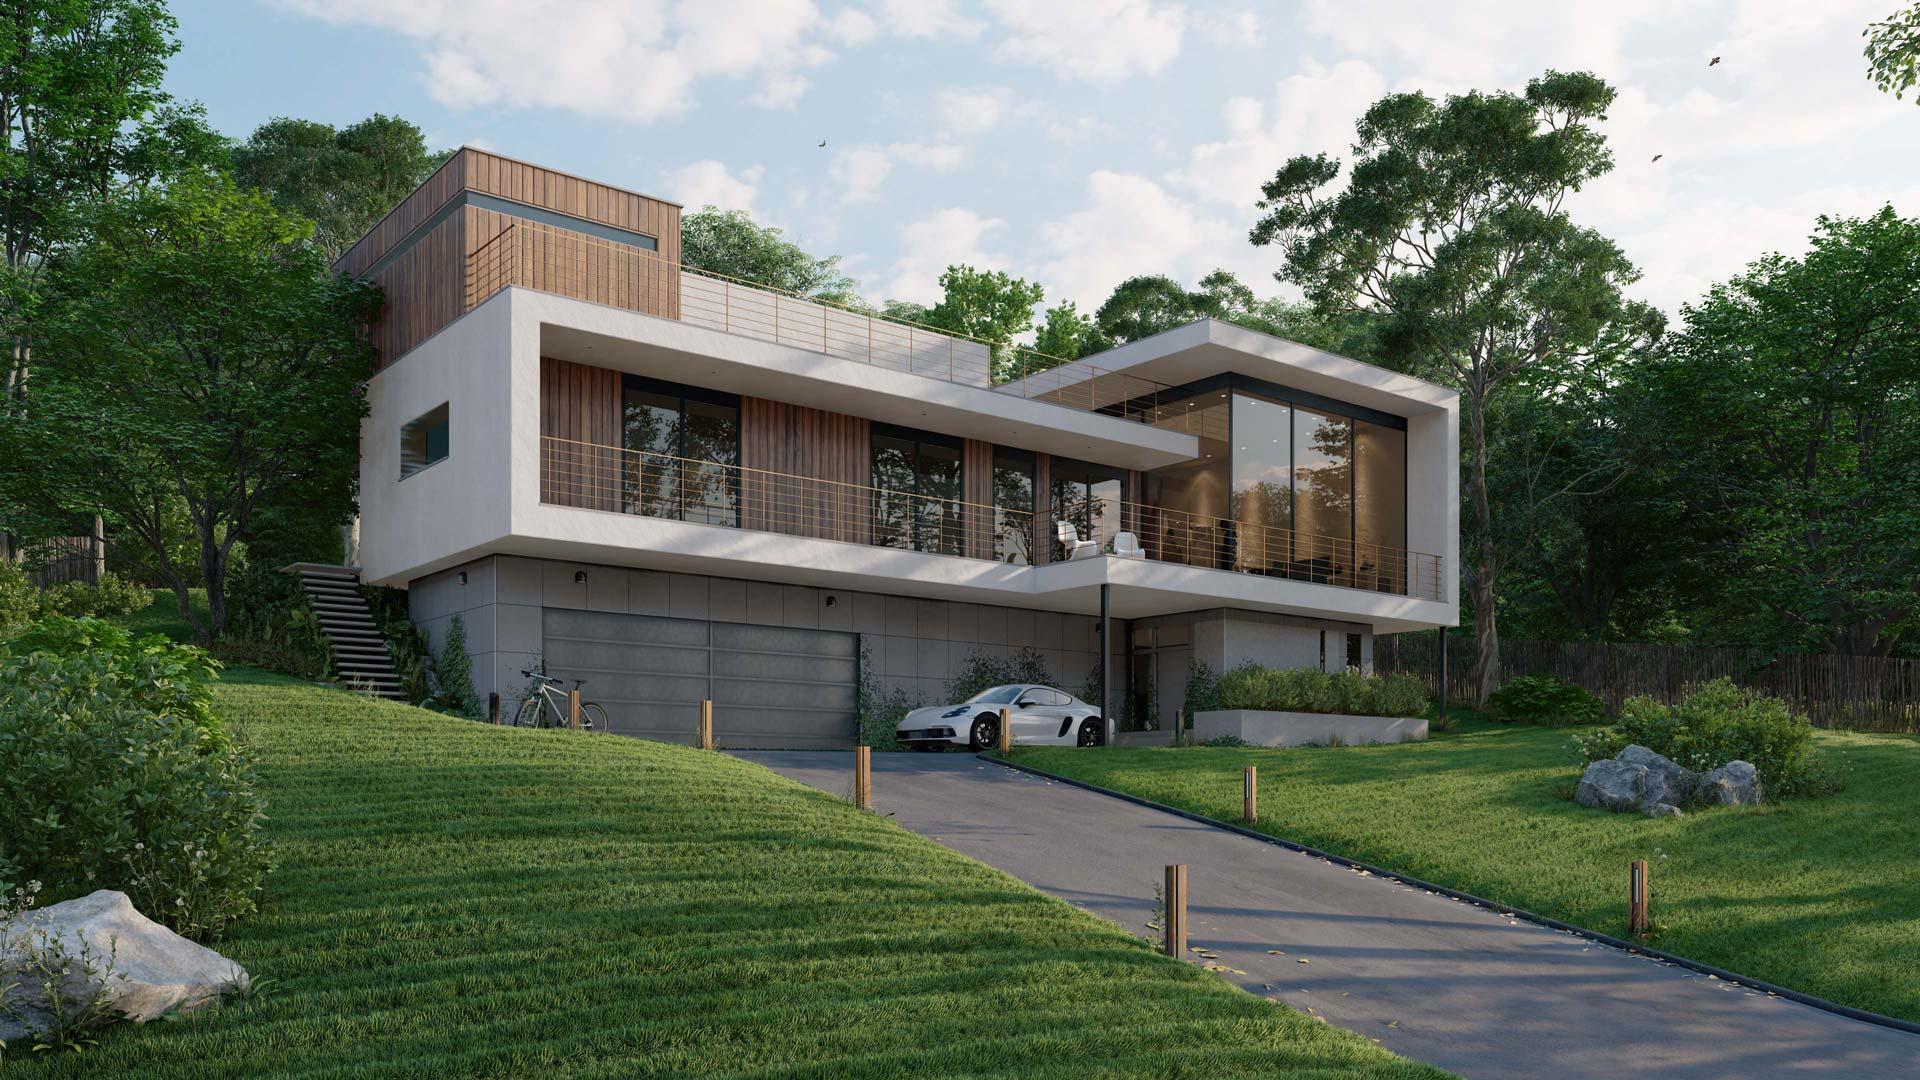 Lumion exterior long shot | Lumion Architectural Rendering